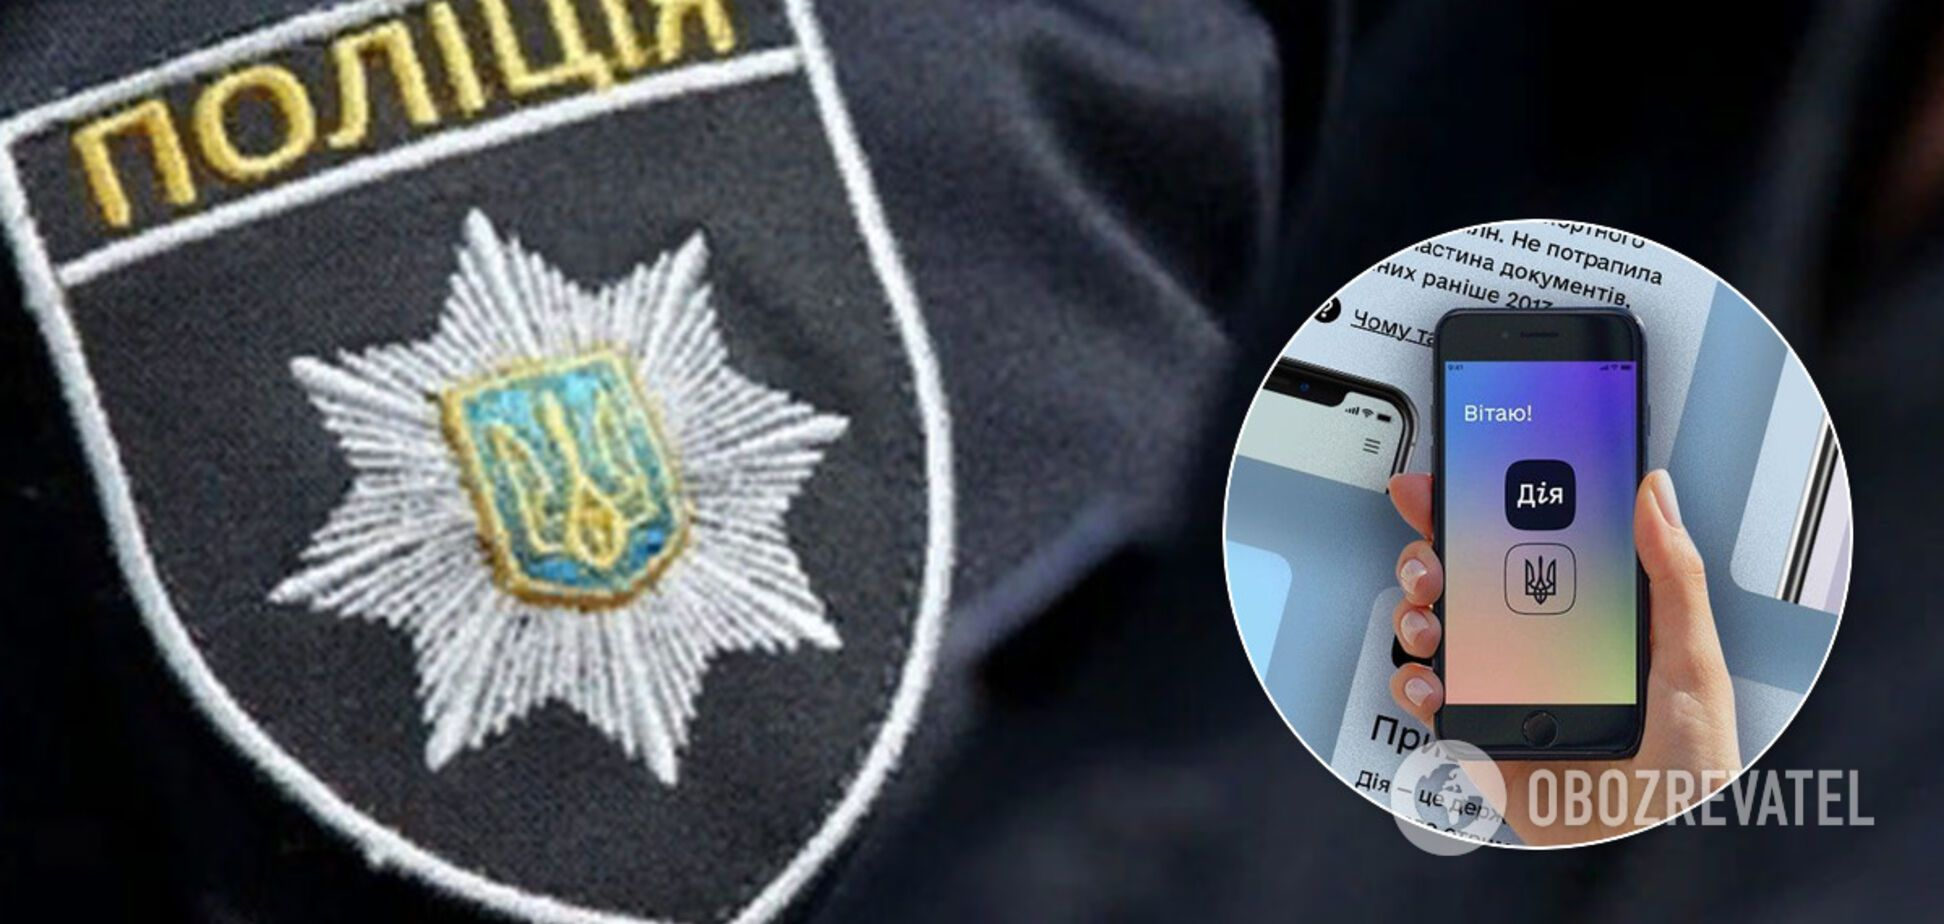 Масштабная утечка данных украинцев: полиция начала расследование